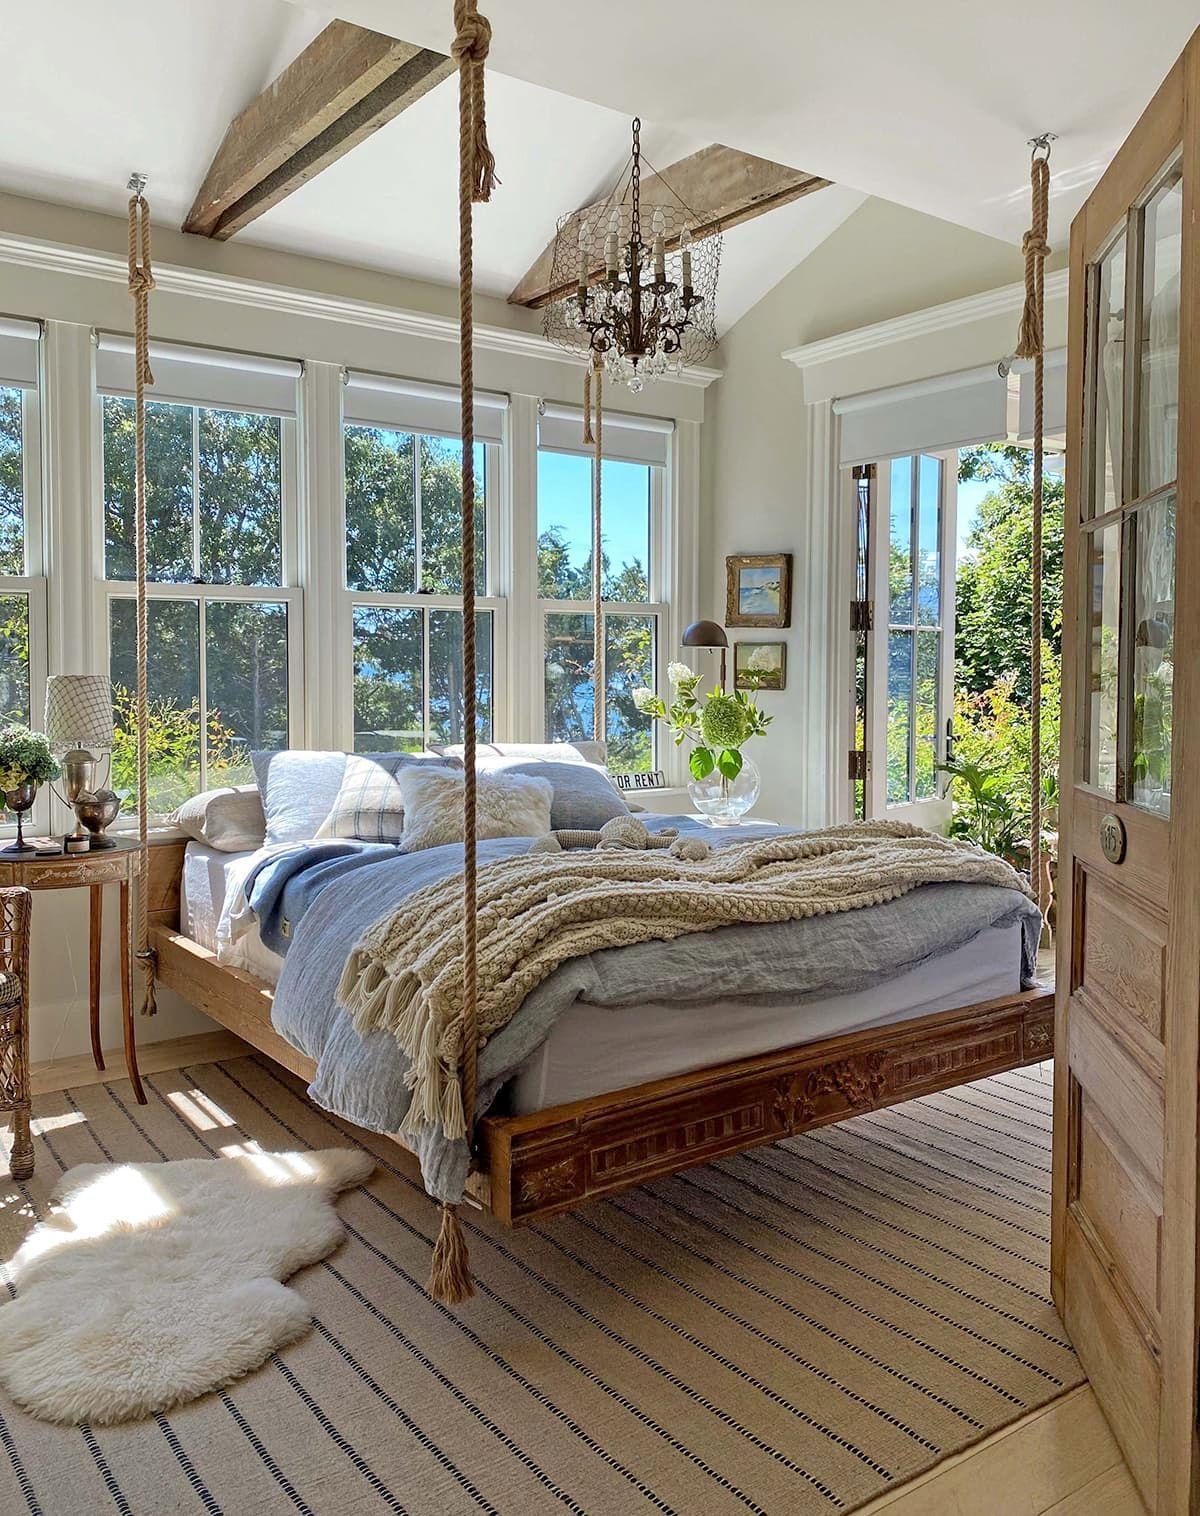 Stunning Classic Cape Cod Home Inspiring Home Tour Cottage House Interior Beach House Interior Design Beach House Bedroom